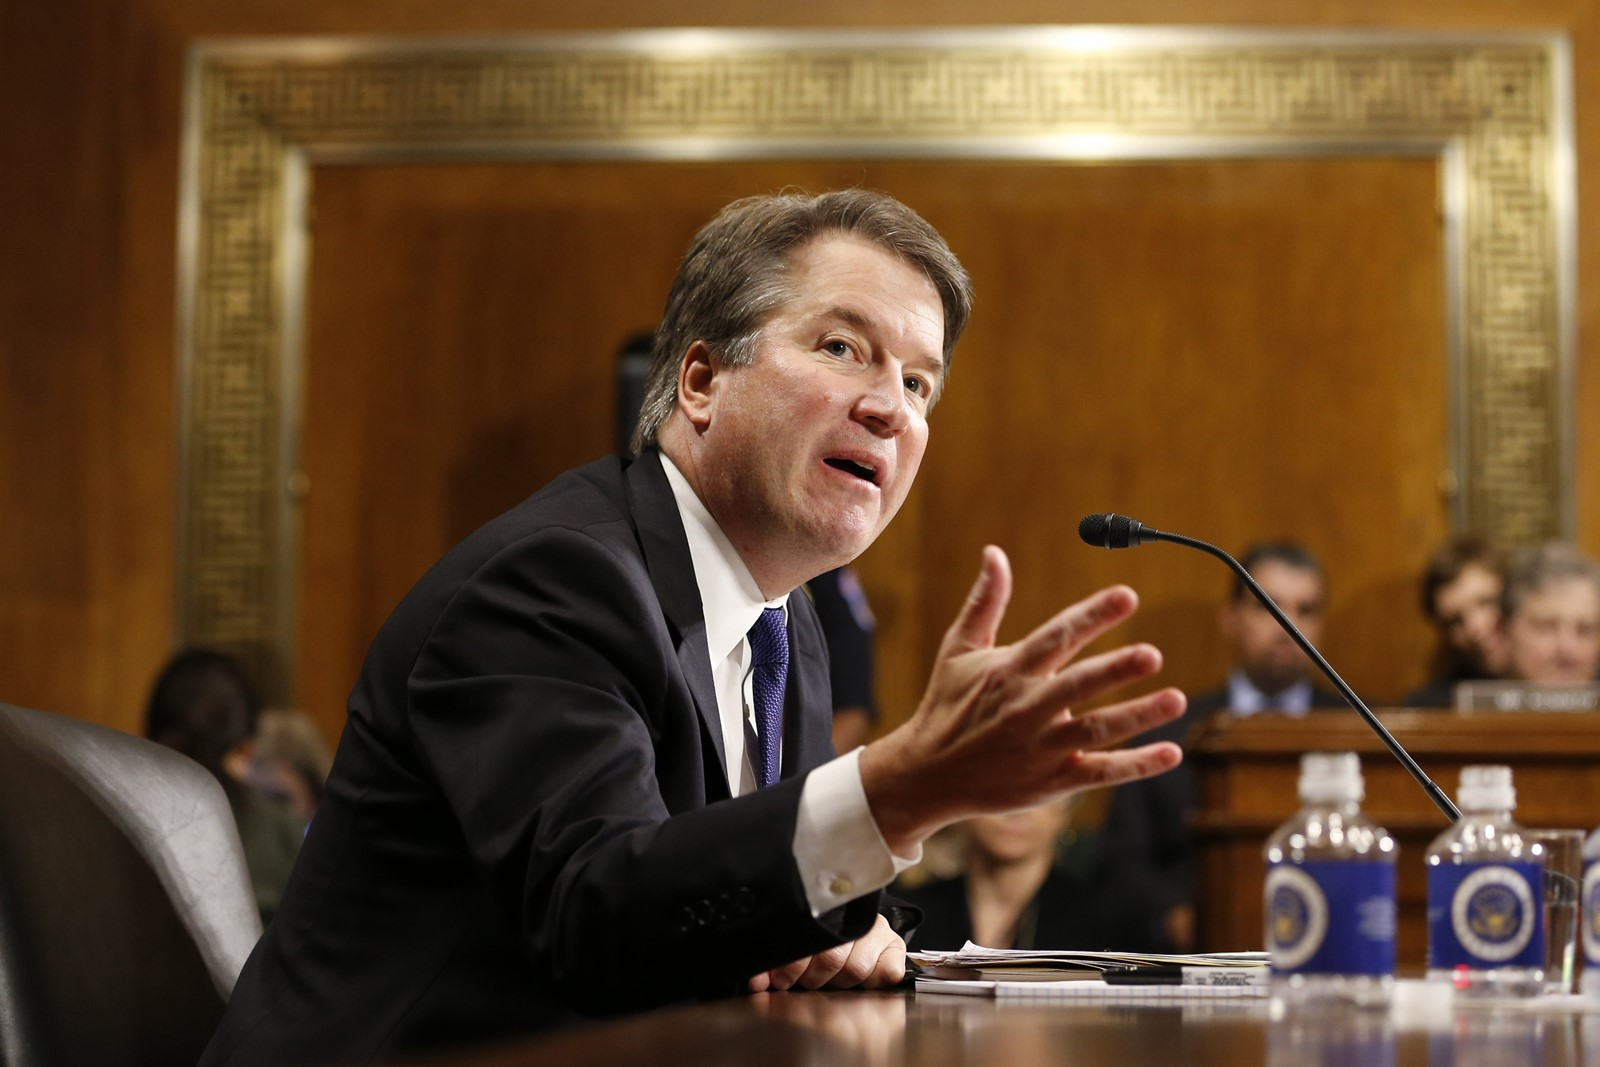 Print Too partisan for high court? Kavanaugh's bitter testimony